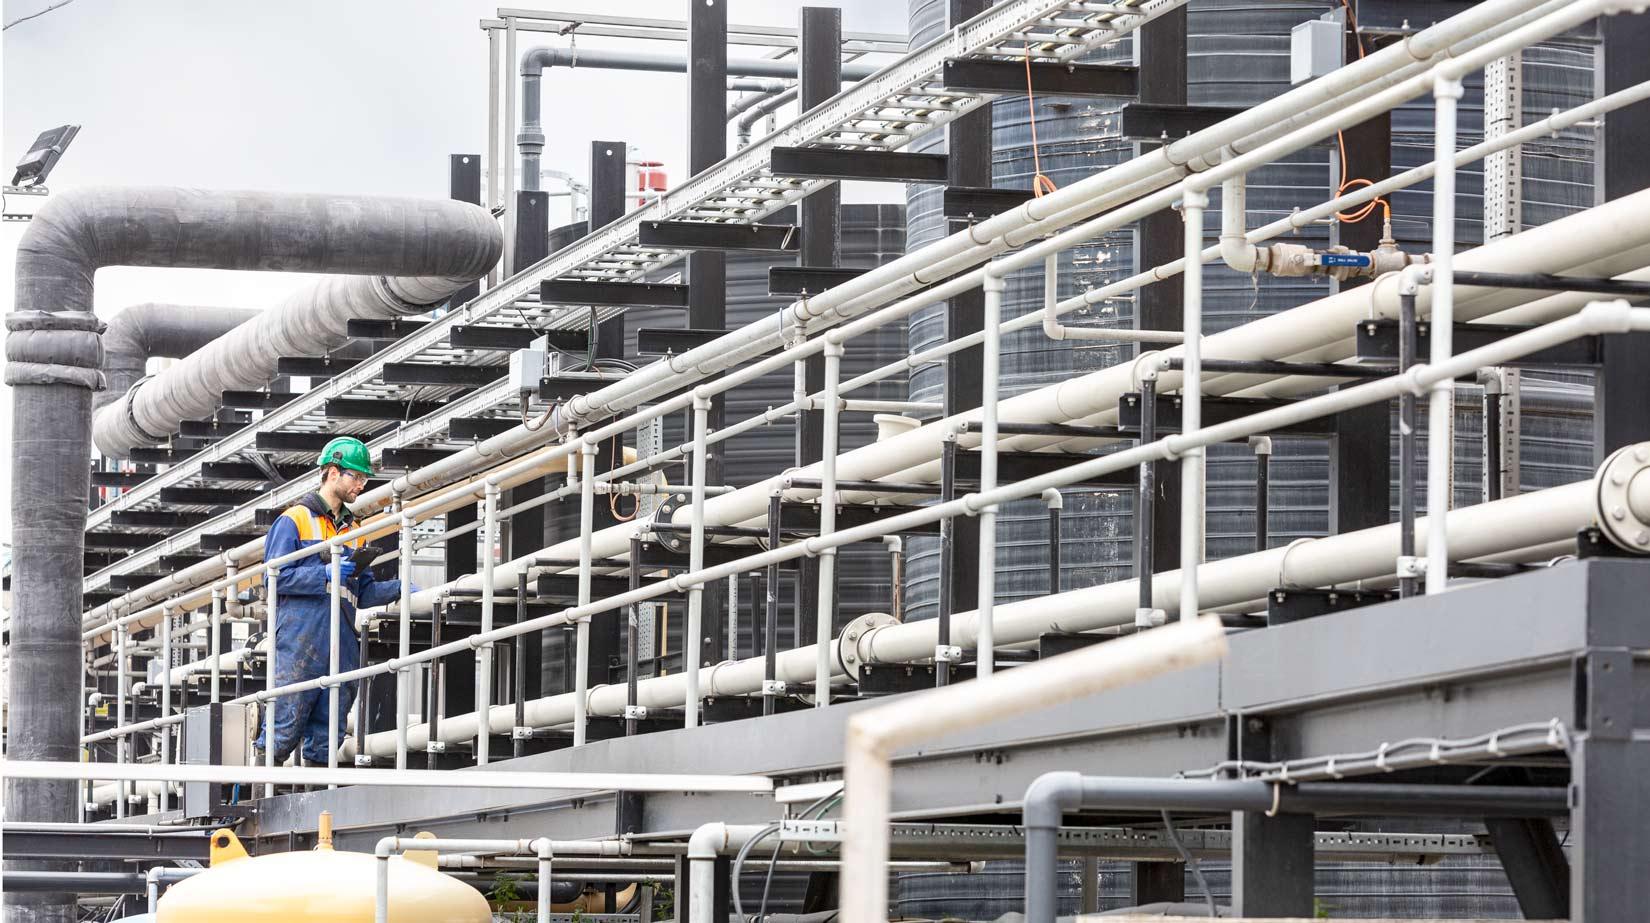 Industrial-photoshoot-engineer-valve-inspection